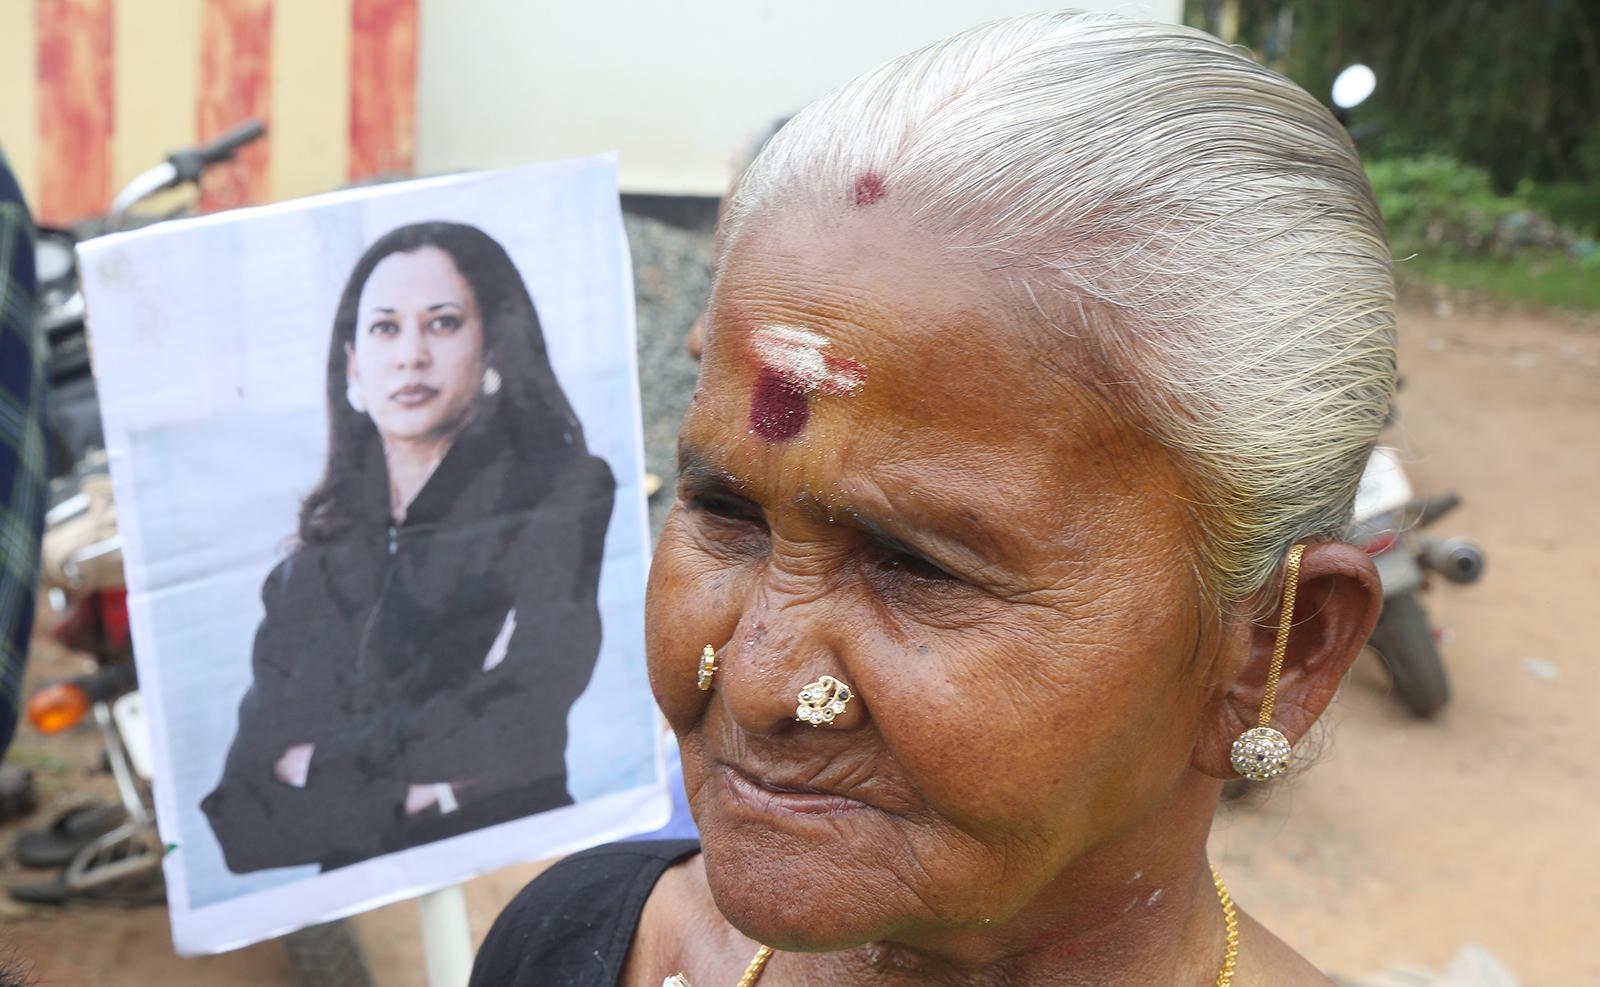 A villager stands next to photo of US Vice President-elect Kamala Harris at Thulasendrapuram village in Tamil Nadu, India, 20 January 2021. EPA